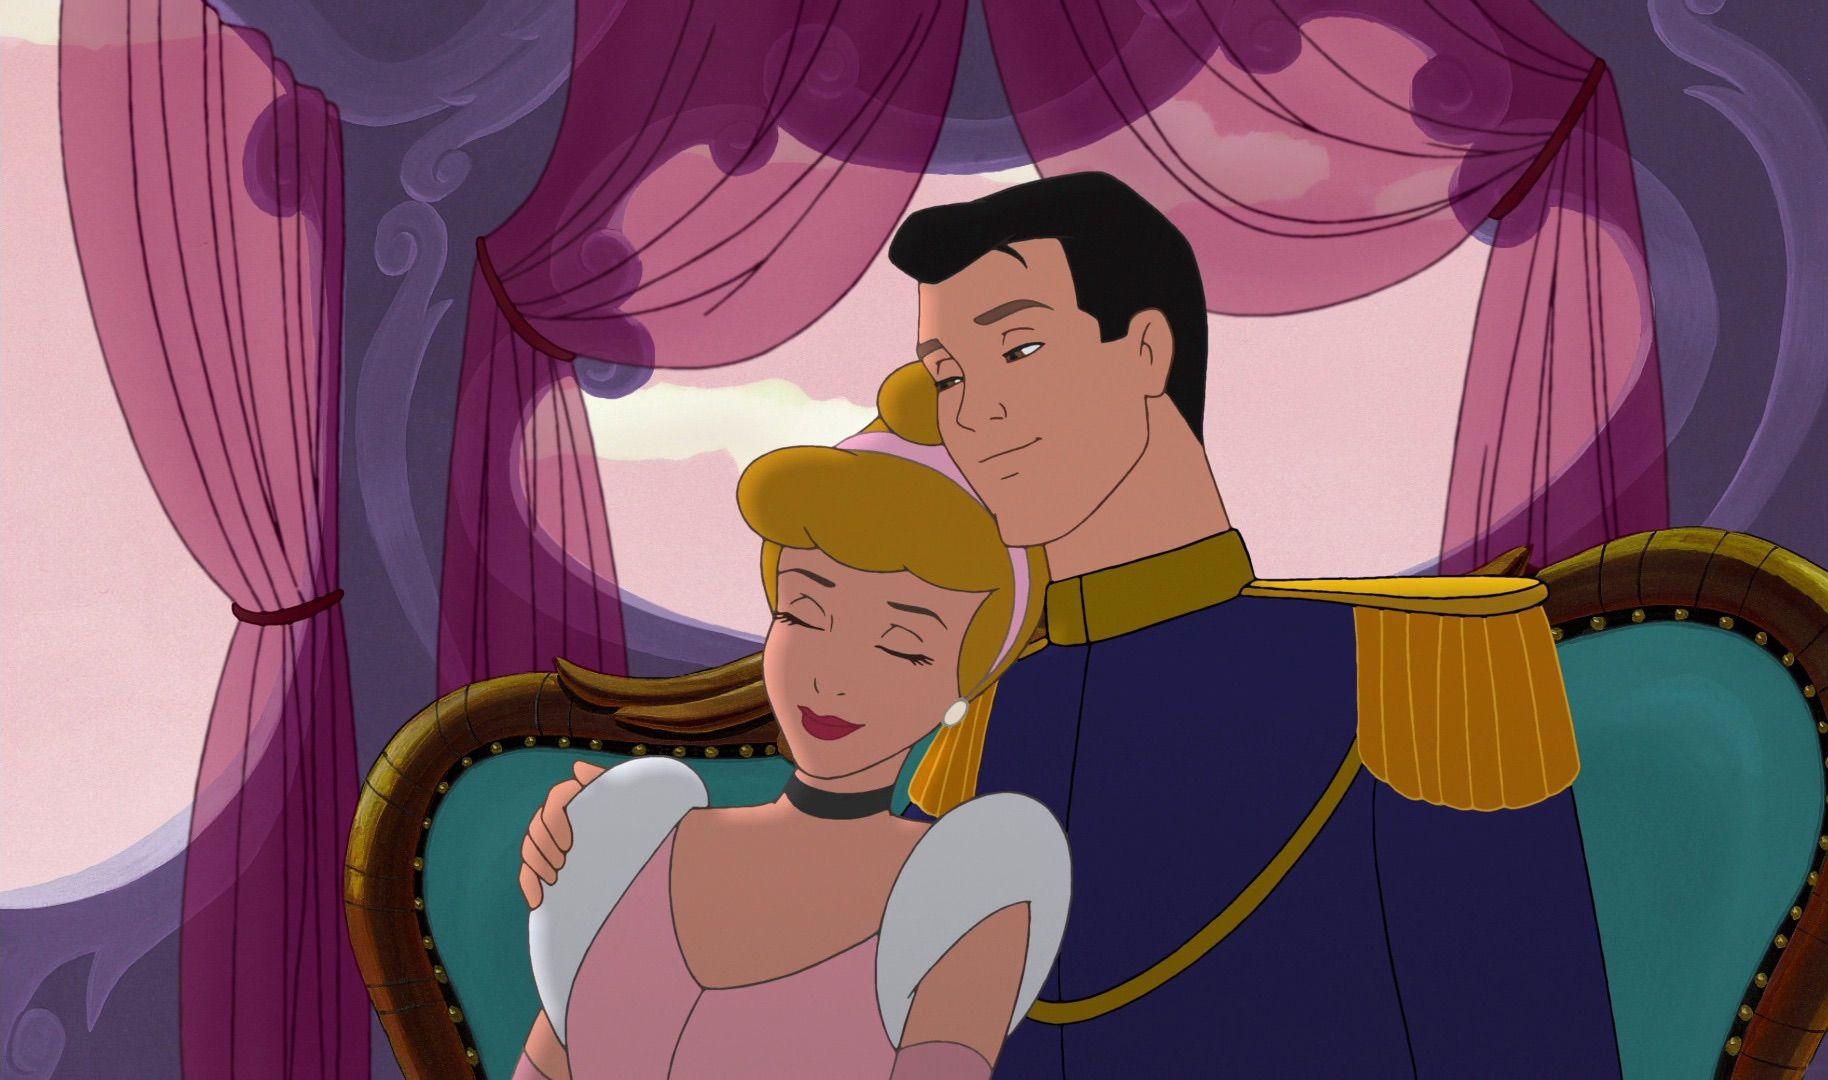 Cinderella and Prince Charming | Cinderella and Prince ...